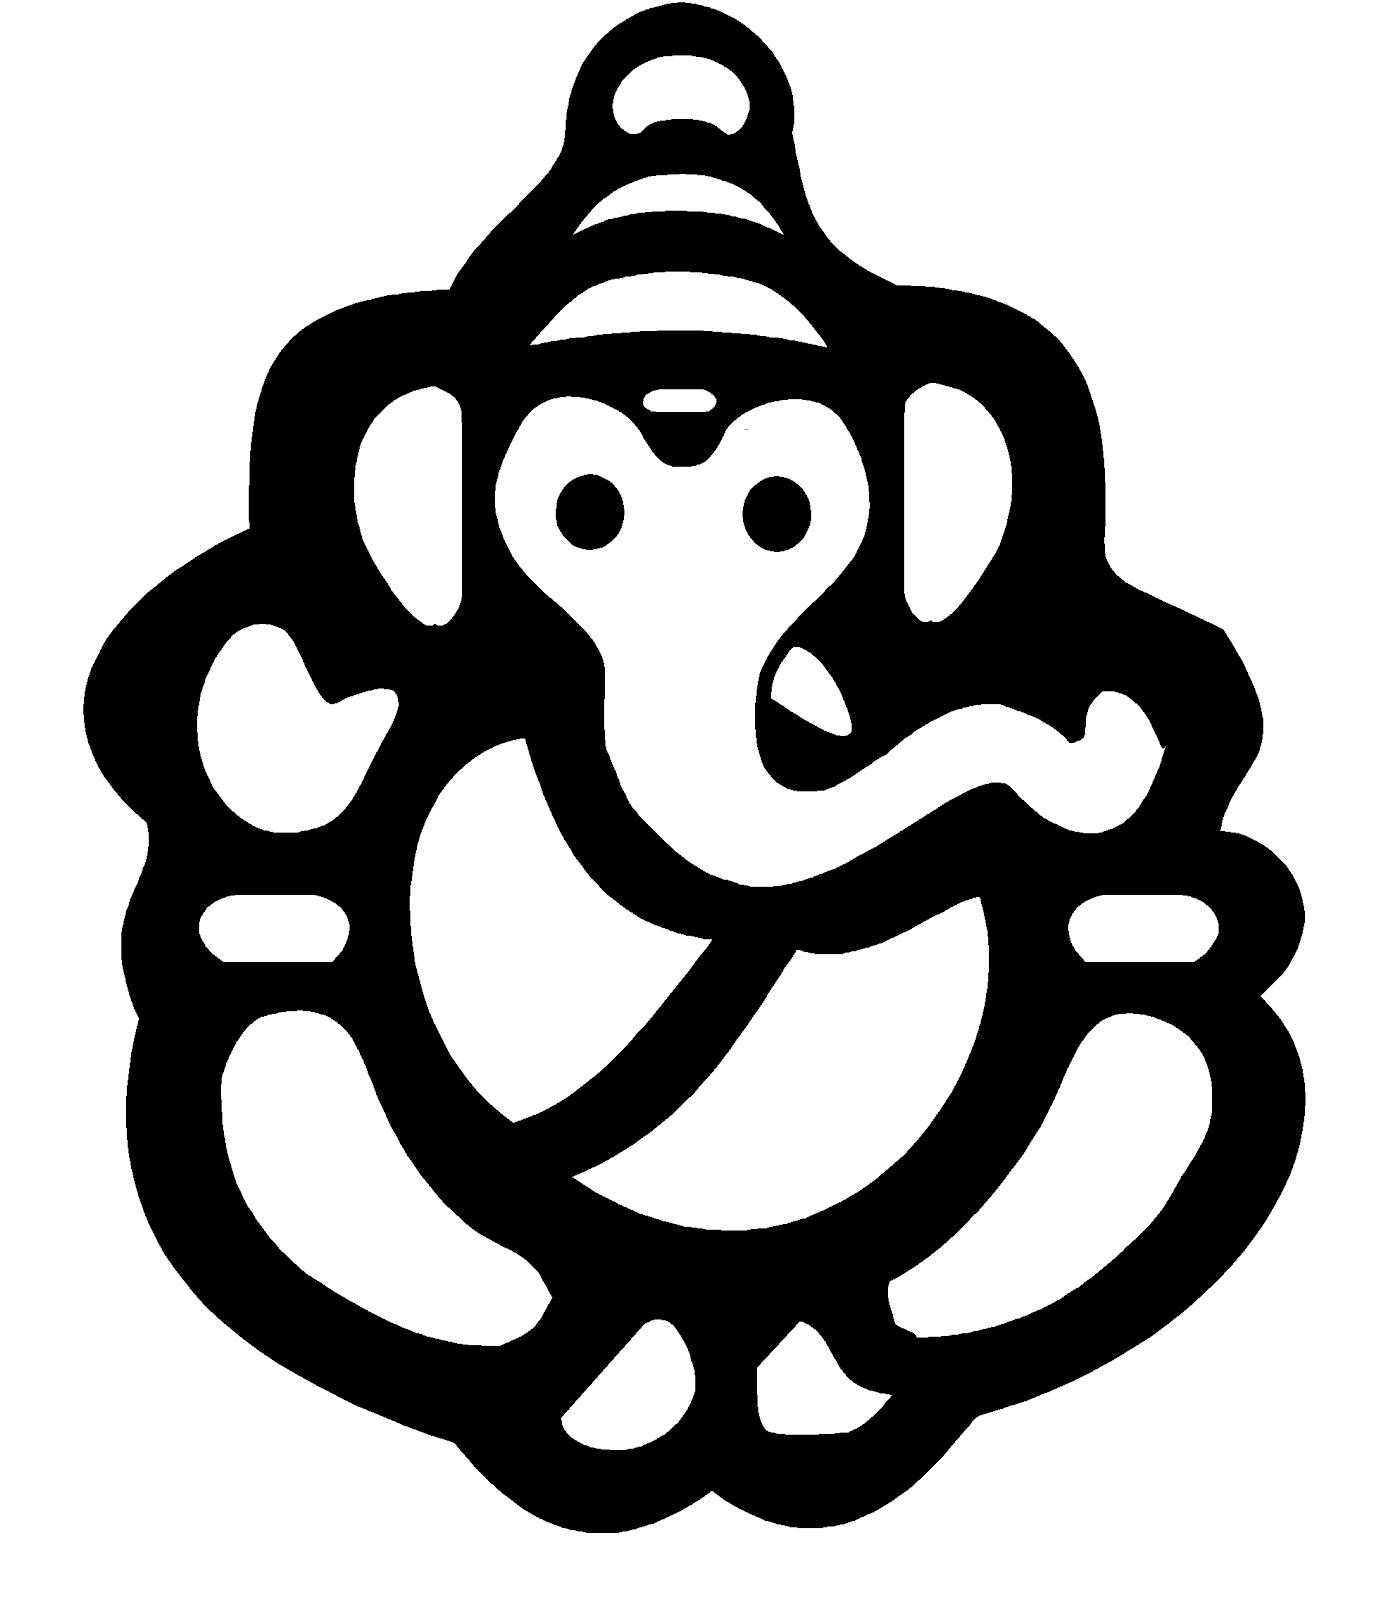 33 ganesha clipart. | Clipart Panda - Free Clipart Images